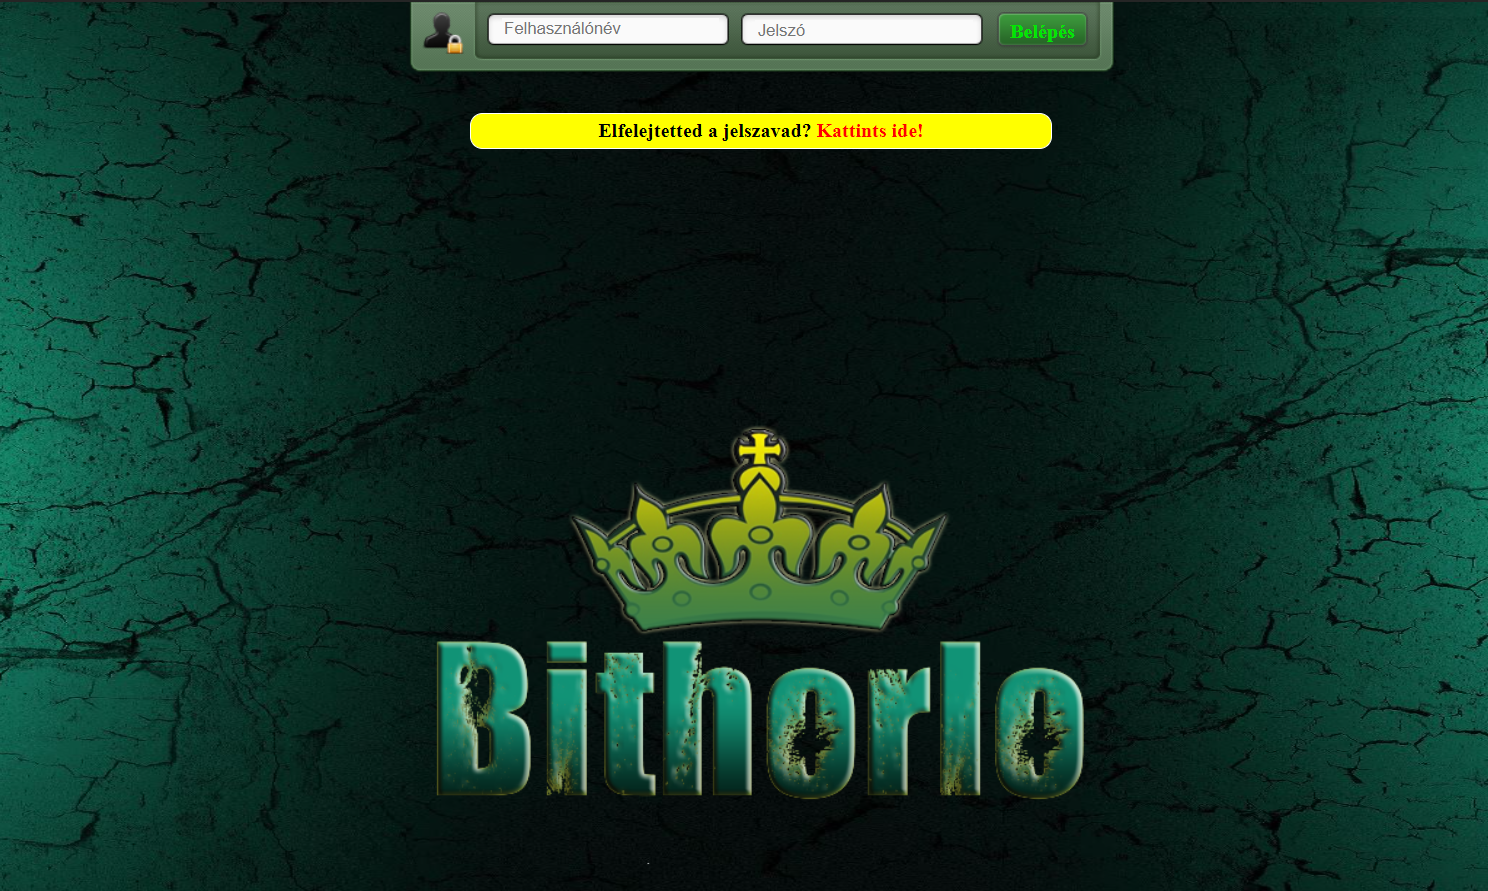 Bithorlo website image